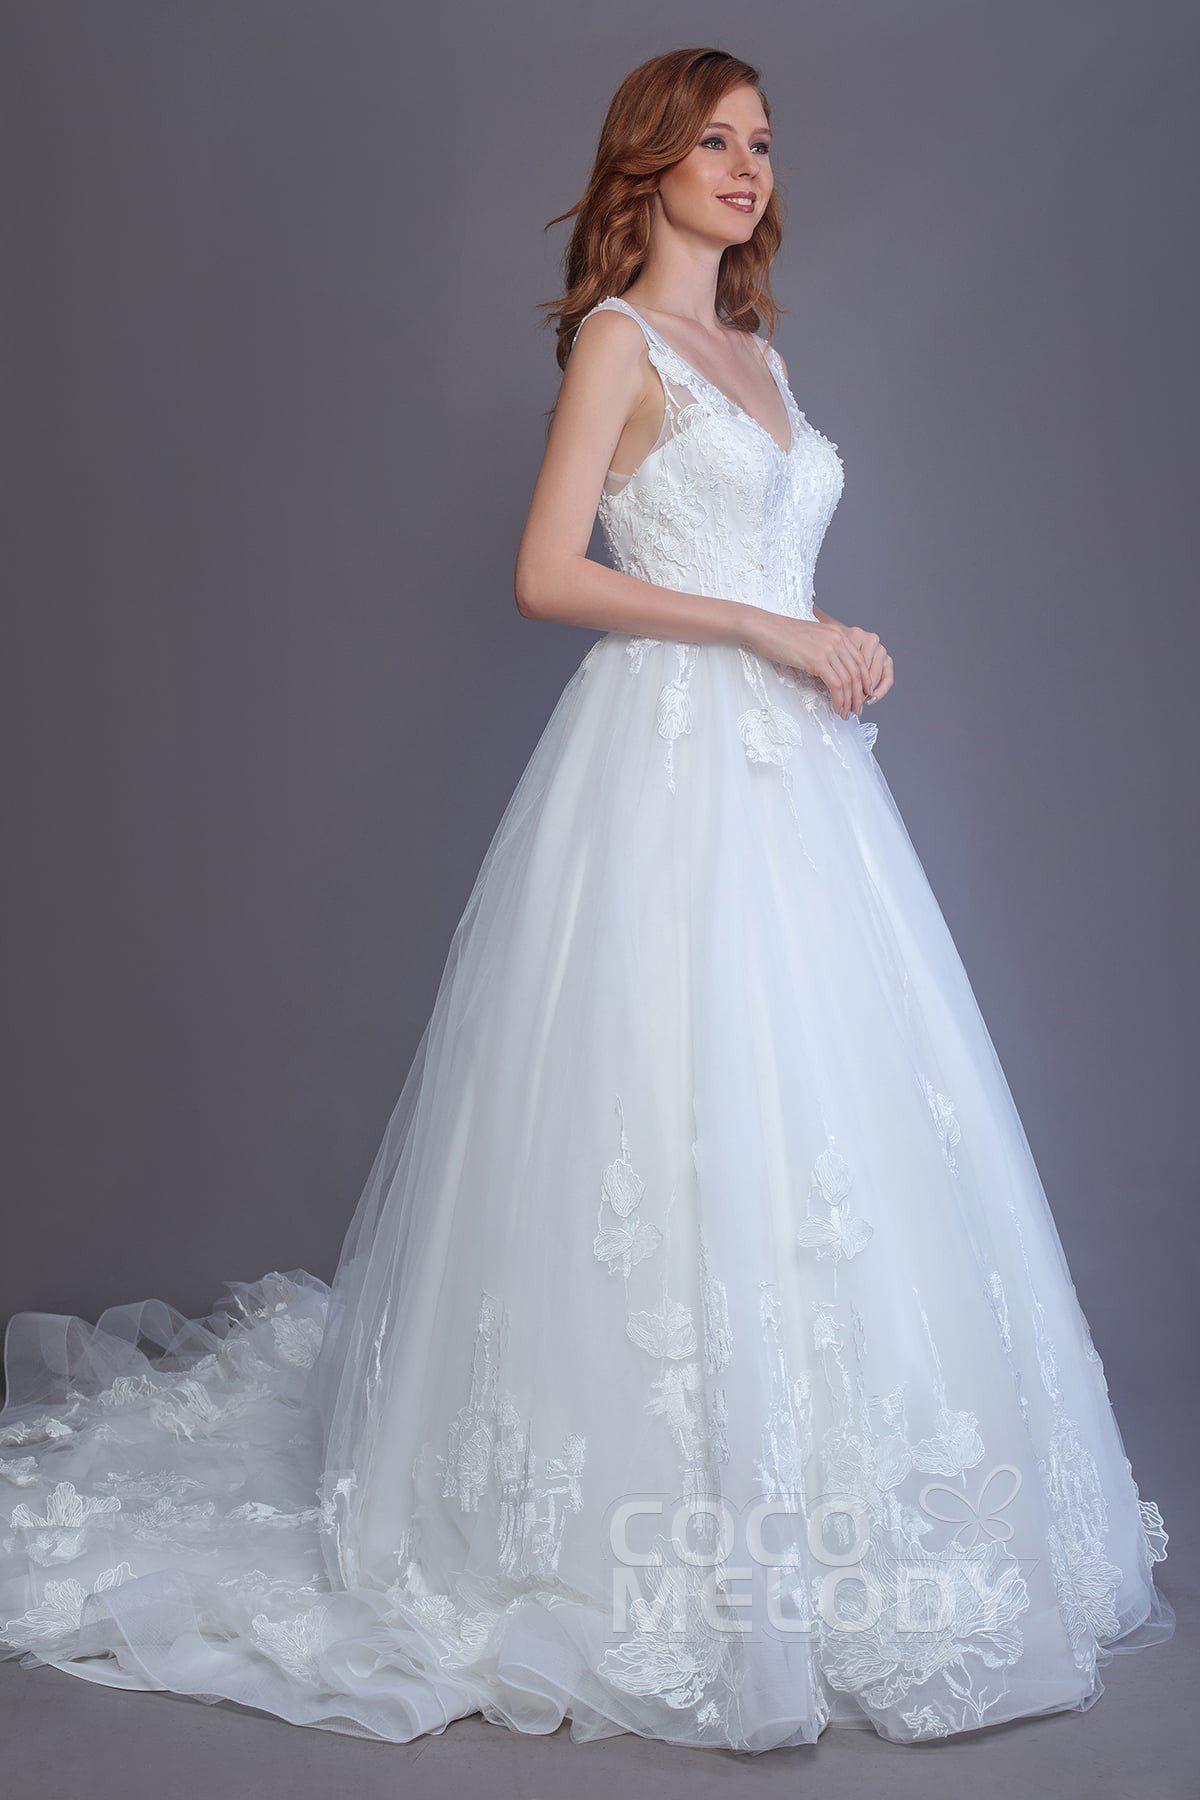 Princess Chapel Train Tulle Lace and Organza Wedding Dress LD5716